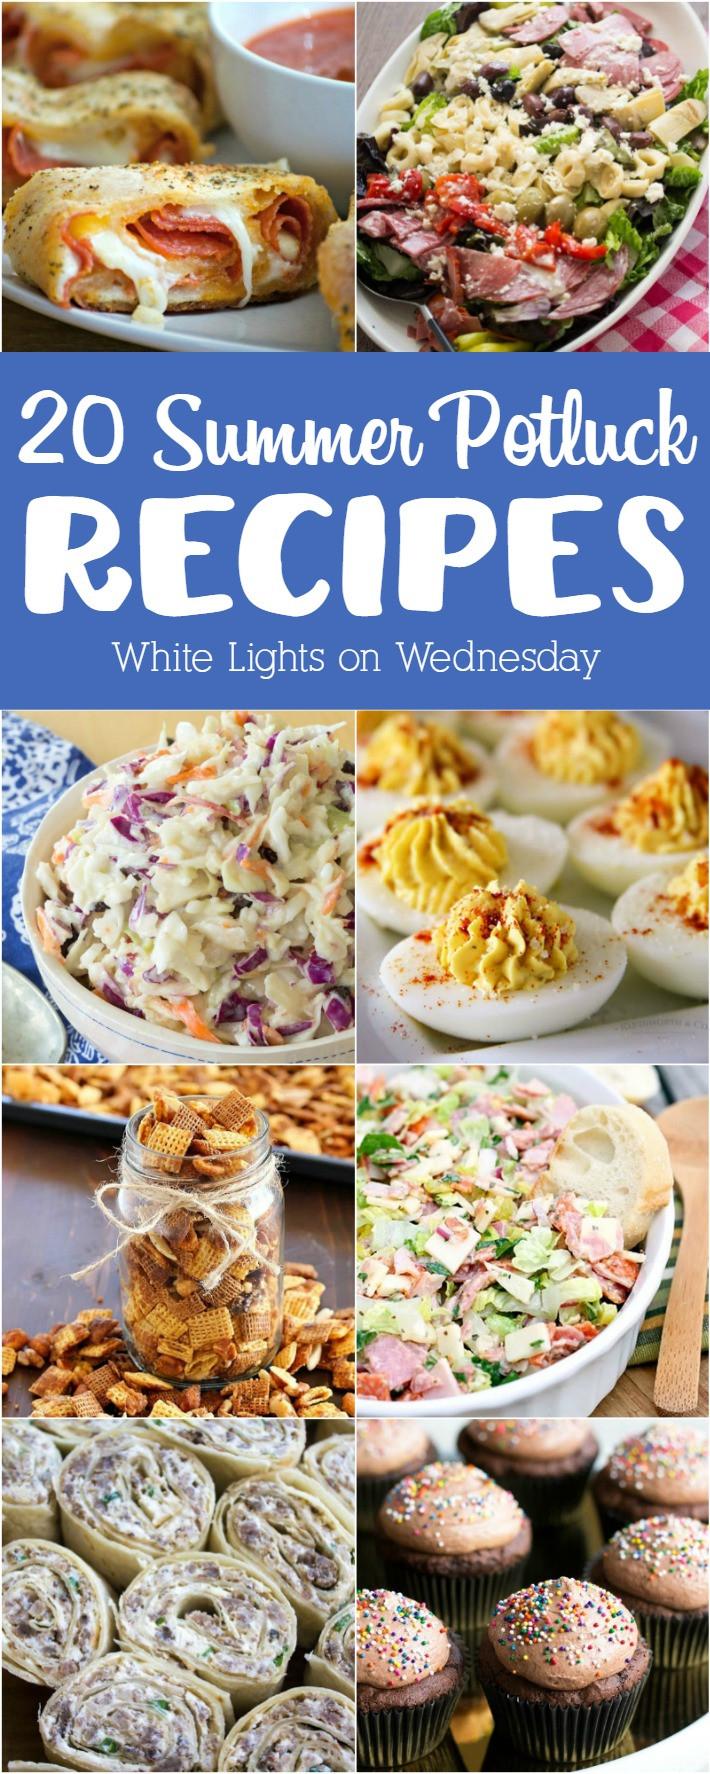 Summer Potluck Main Dishes  20 Summer Potluck Recipes White Lights on Wednesday